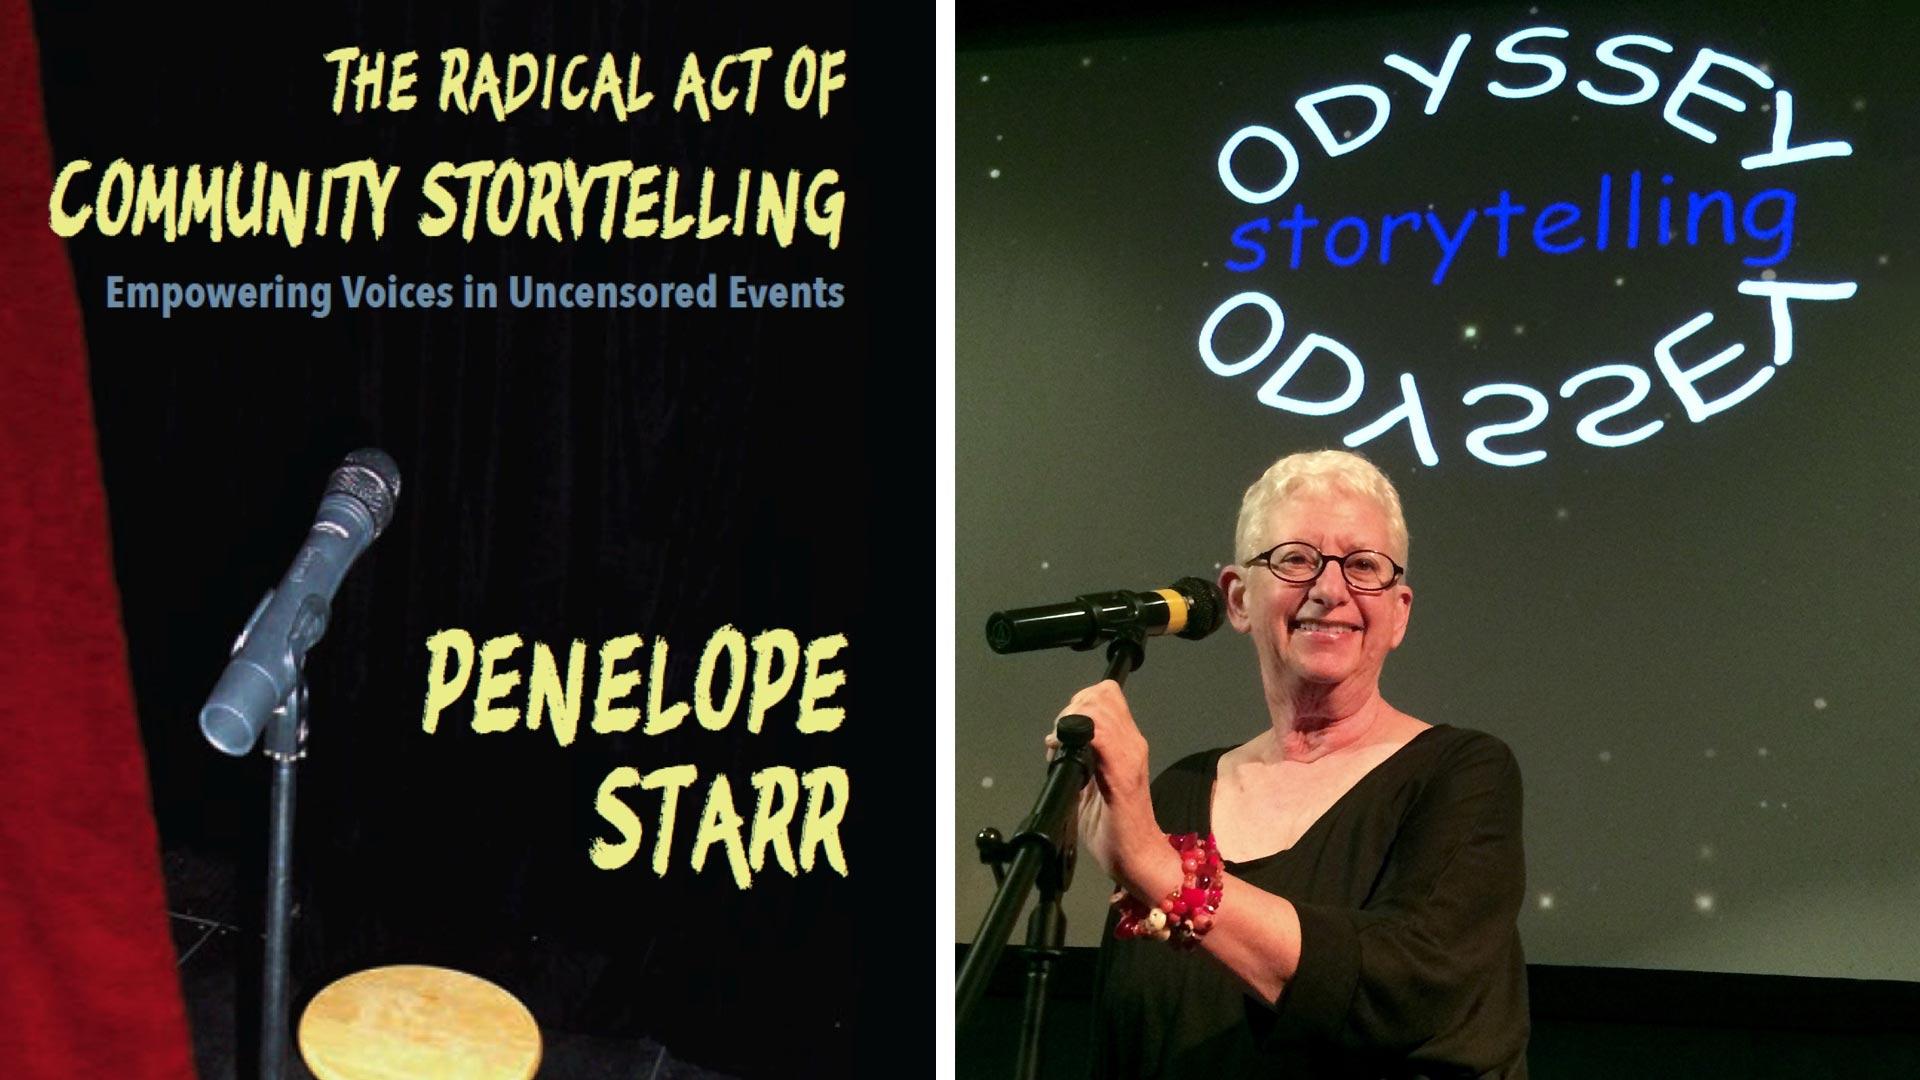 Penelope Starr hero